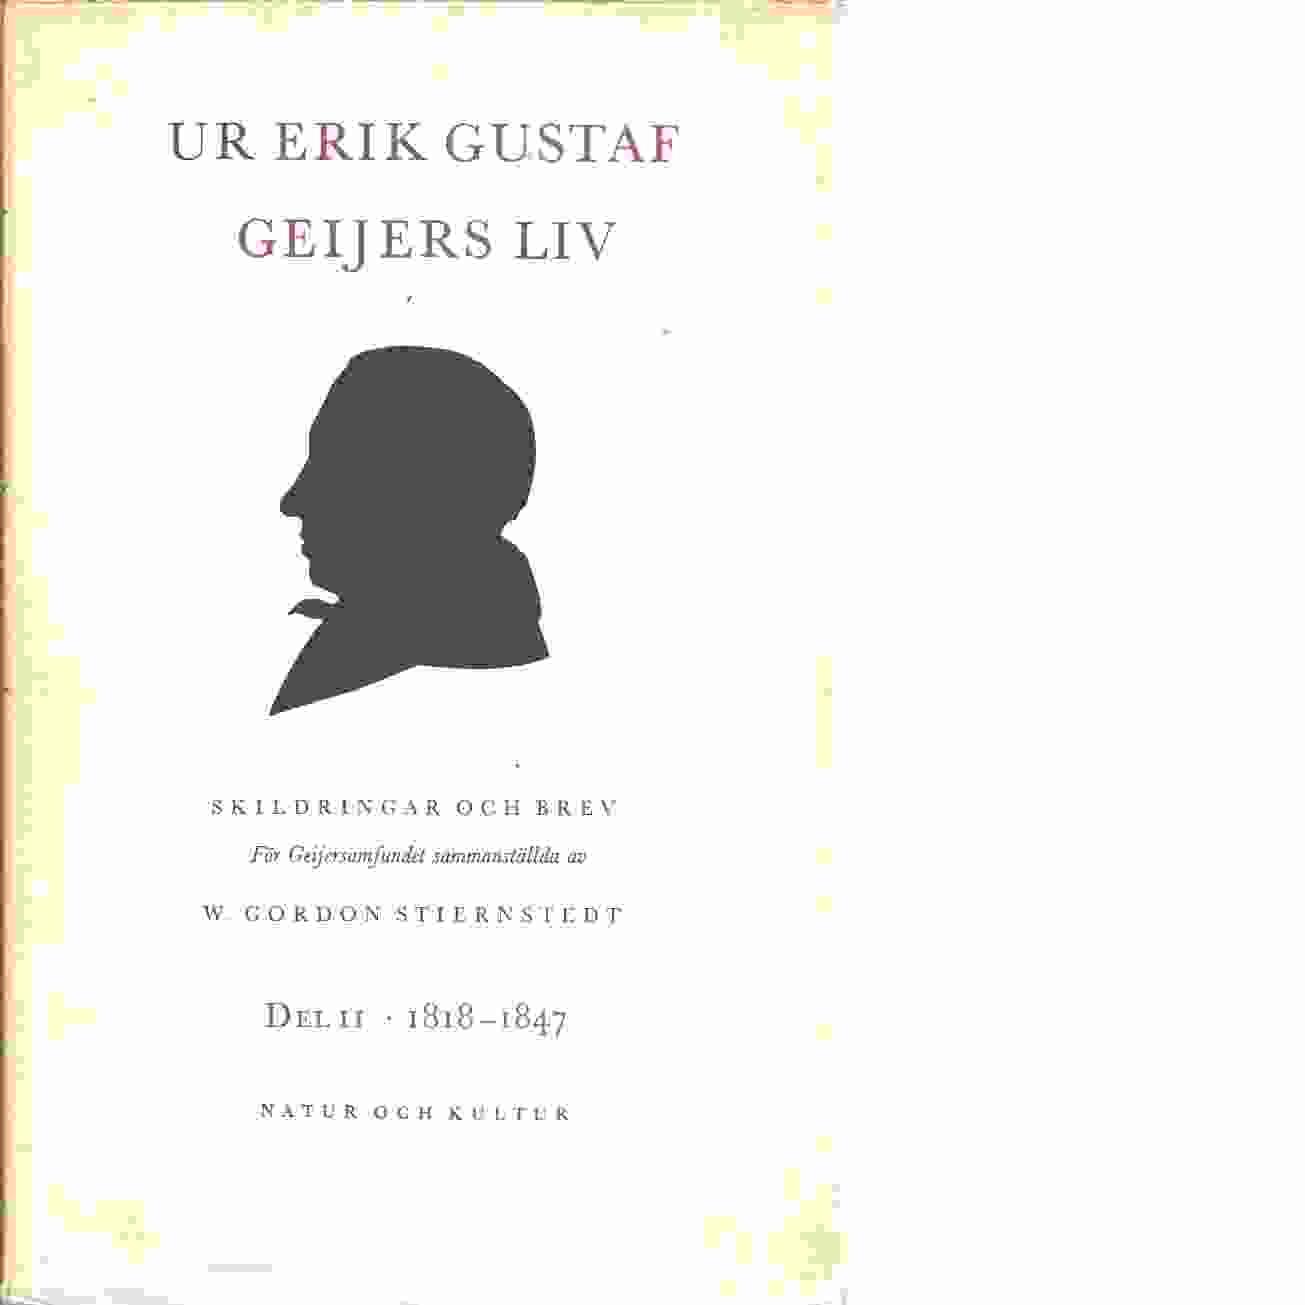 Ur Erik Gustaf Geijers liv : skildringar och brev, de flesta opublicerade. D. 2, 1818-1847 - Geijer, Erik Gustaf